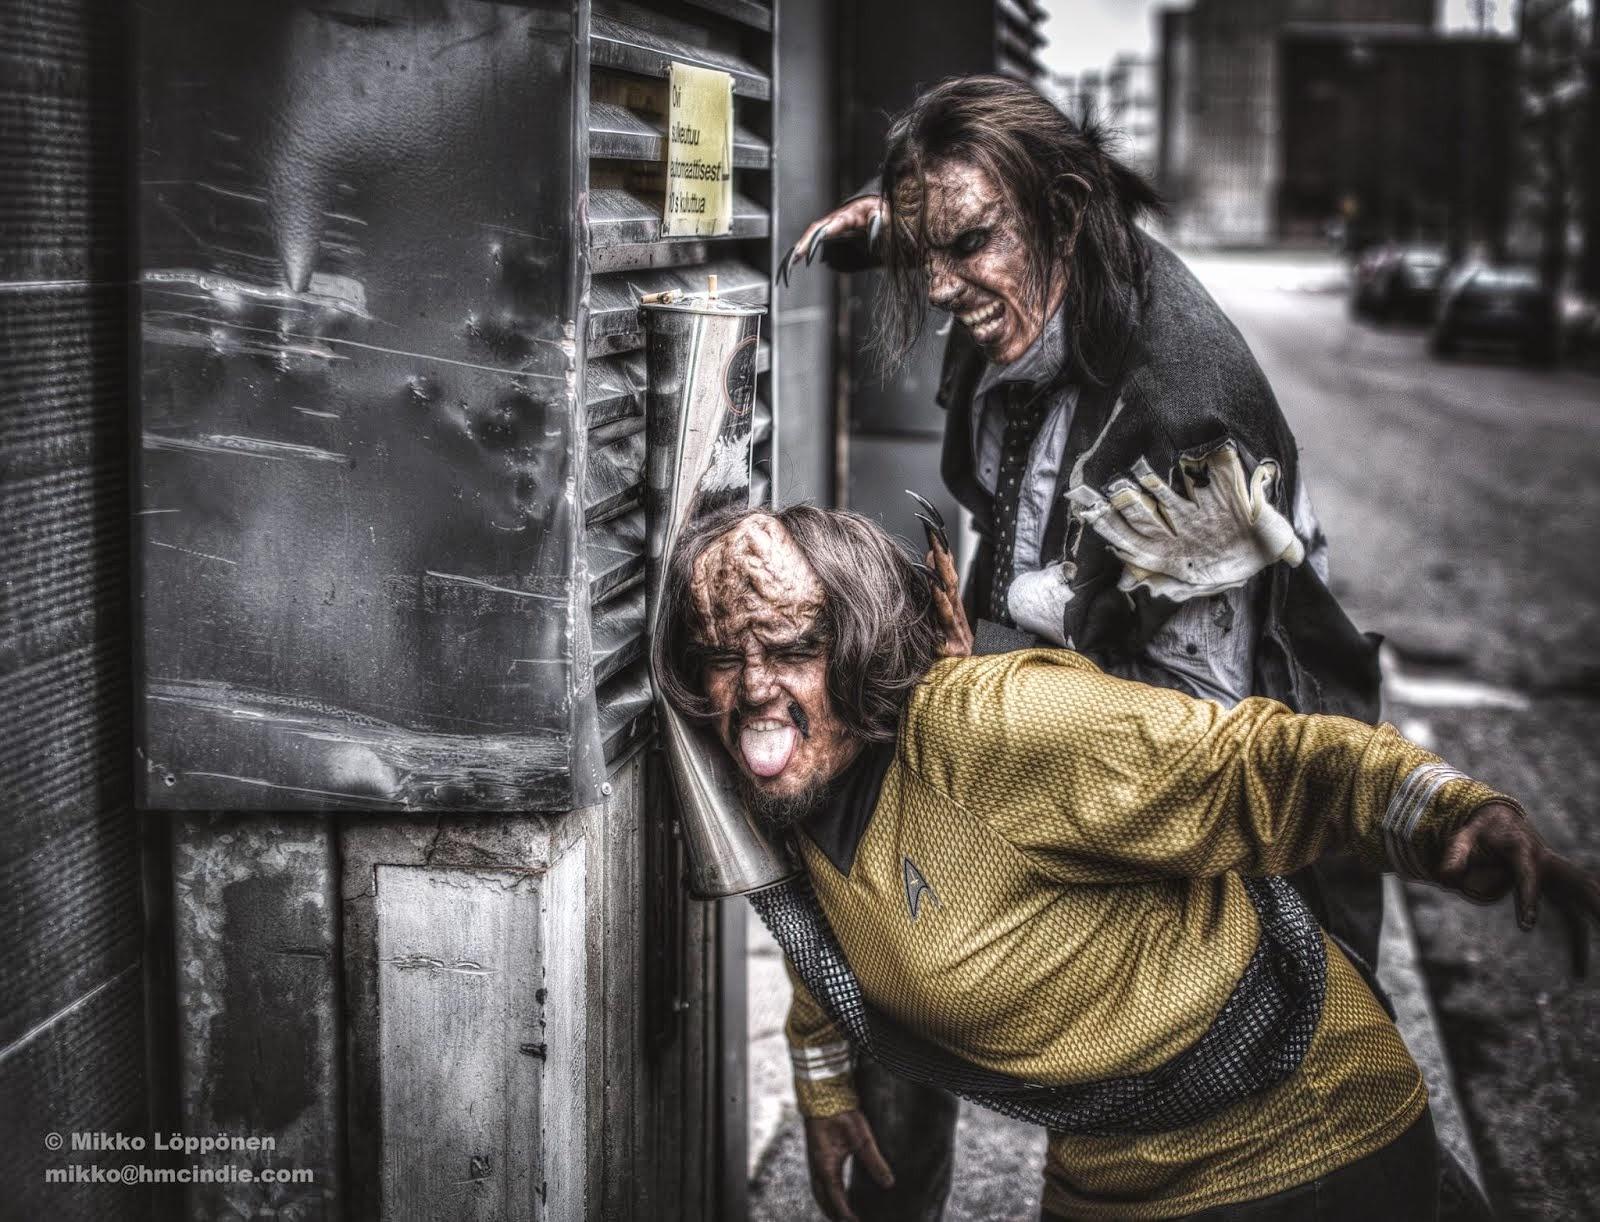 Worf-erine (Ari Savonen) vs. Wolfierine (Janne-Markus Katila). Lovex - California tehostemaskeeraus